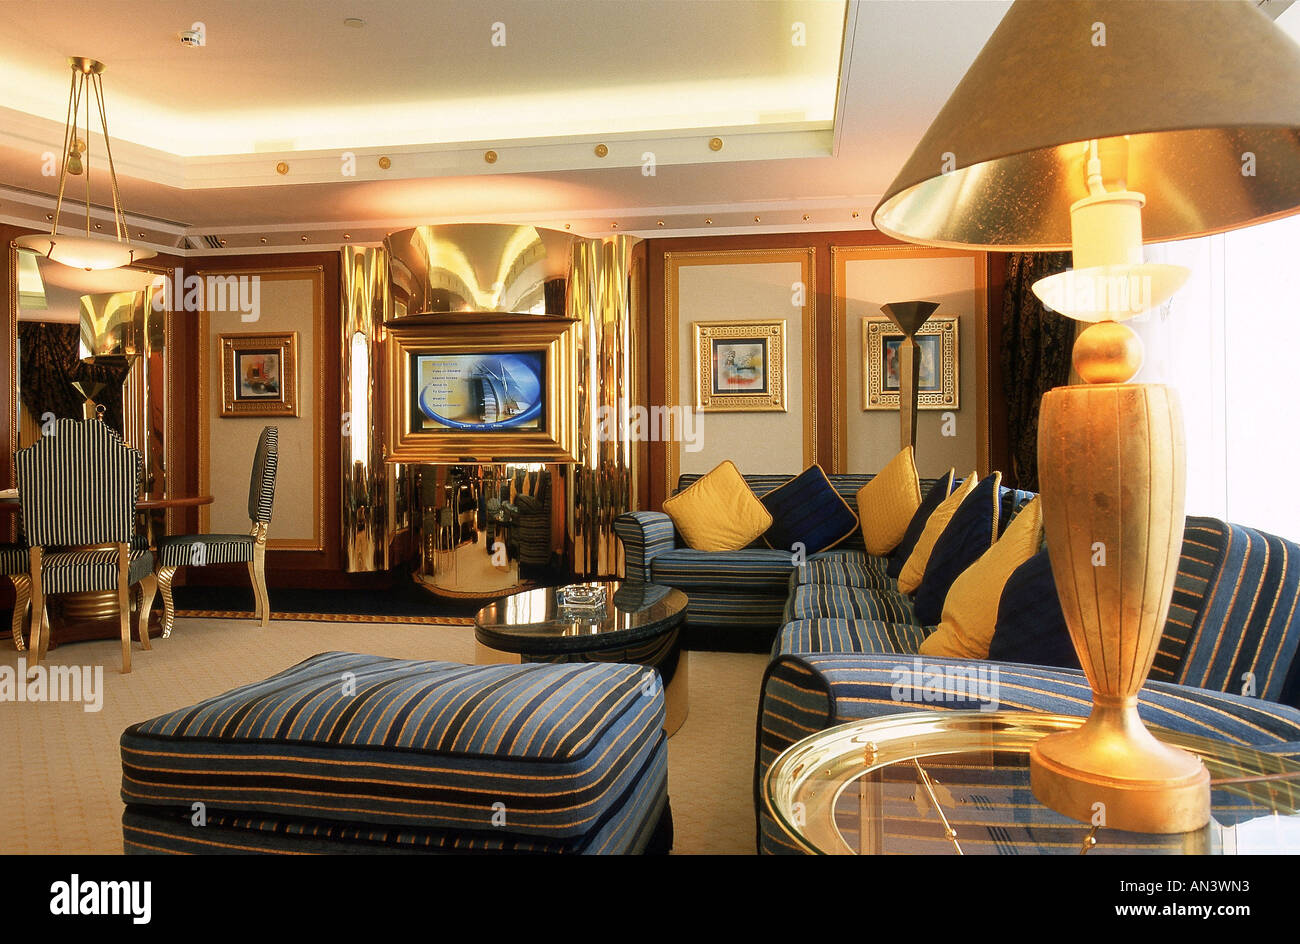 Are united arab emirates dubai 7 star for Design luxushotel dubai